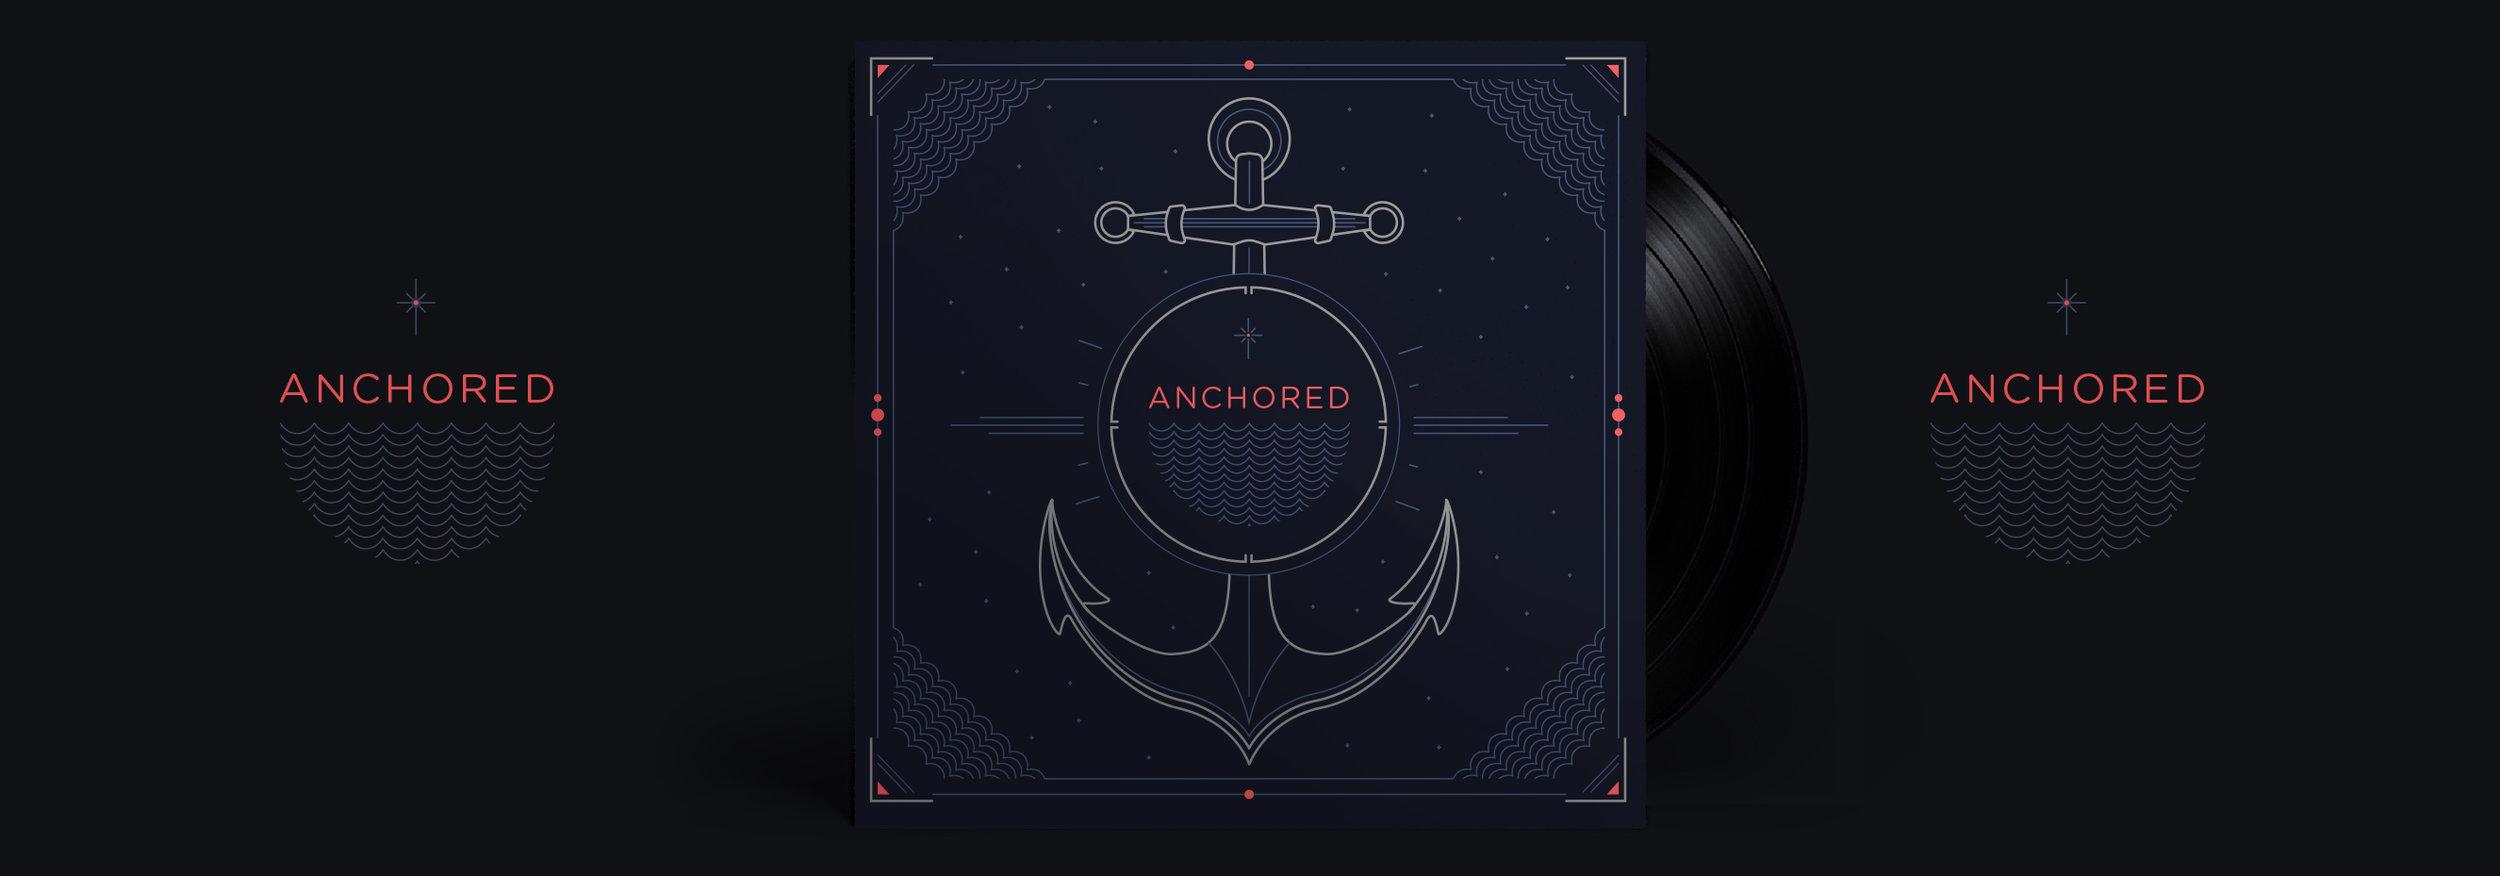 Anchored-Album-2.jpg